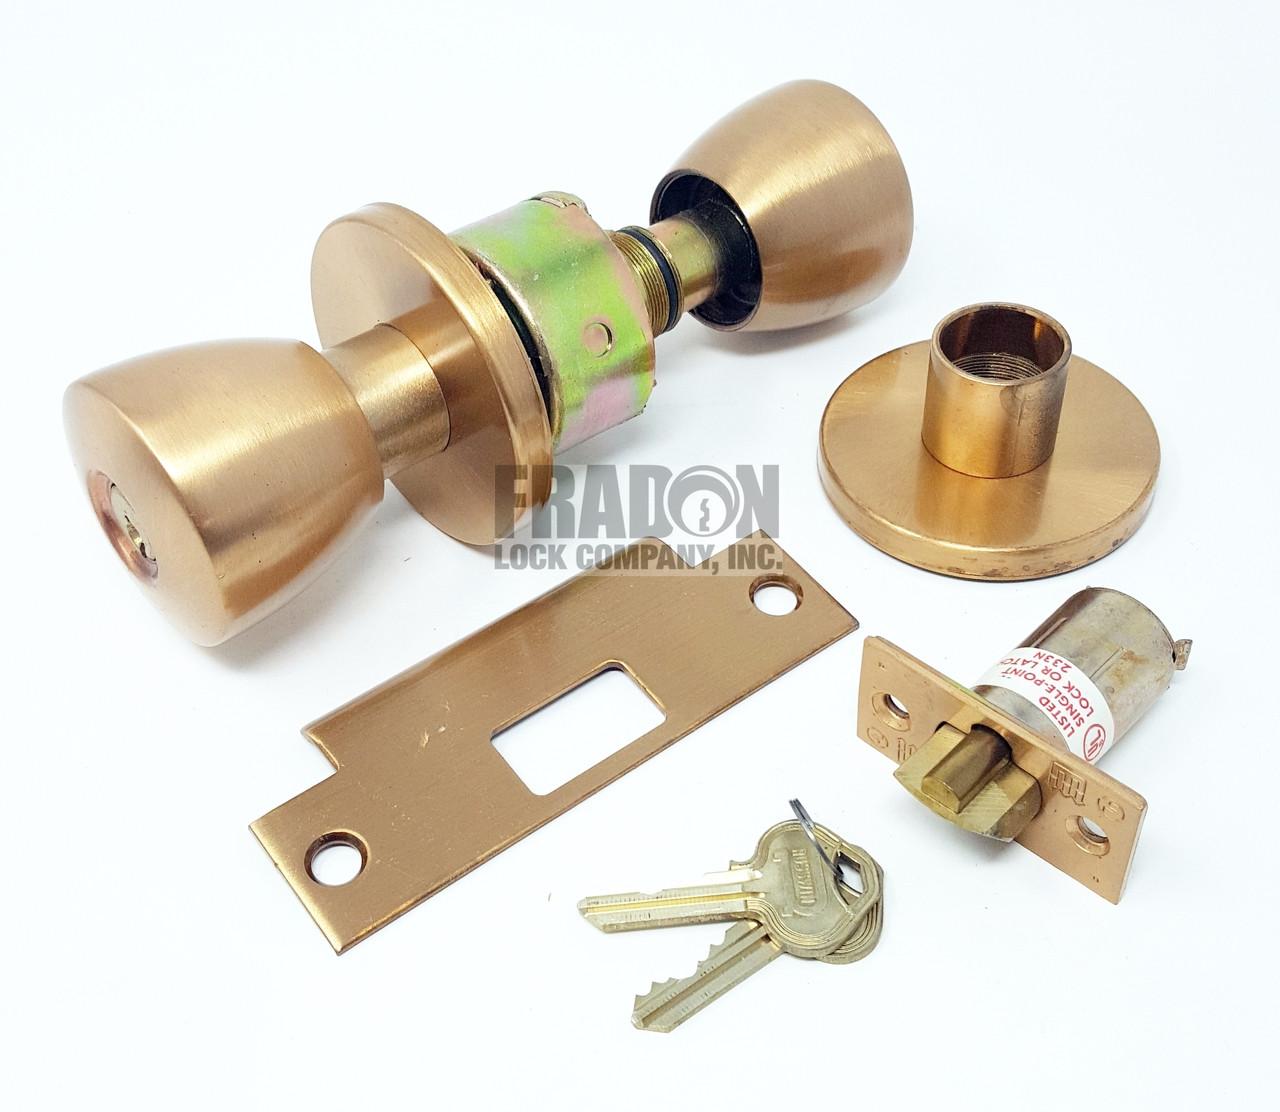 Russwin Heavy Duty Commercial Knob Storeroom Closet Satin Bronze CK4257-BRC-612 NOS